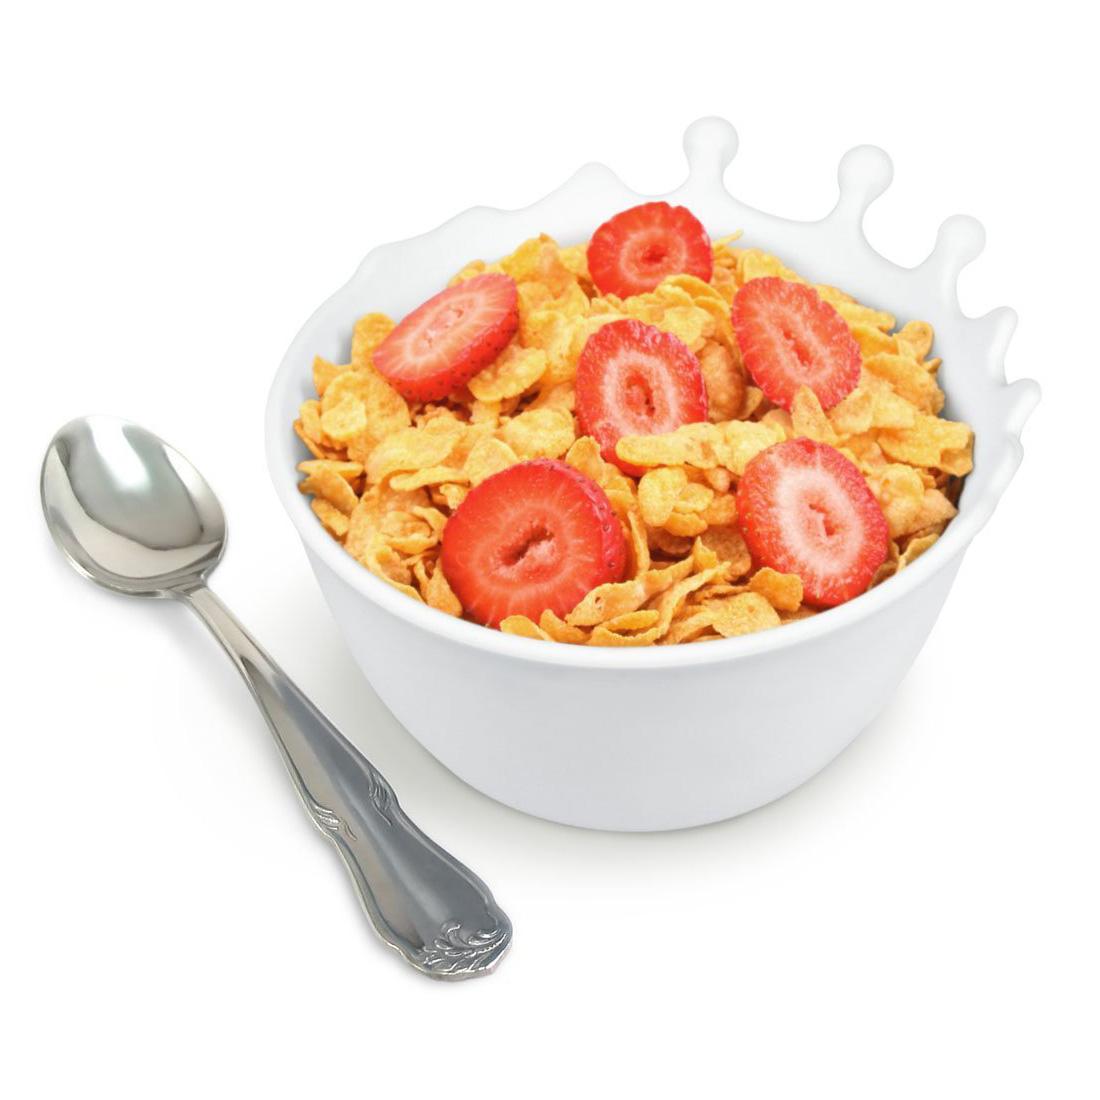 Spilt Milk Soft Flexible And Unbreakable Cereal Bowl